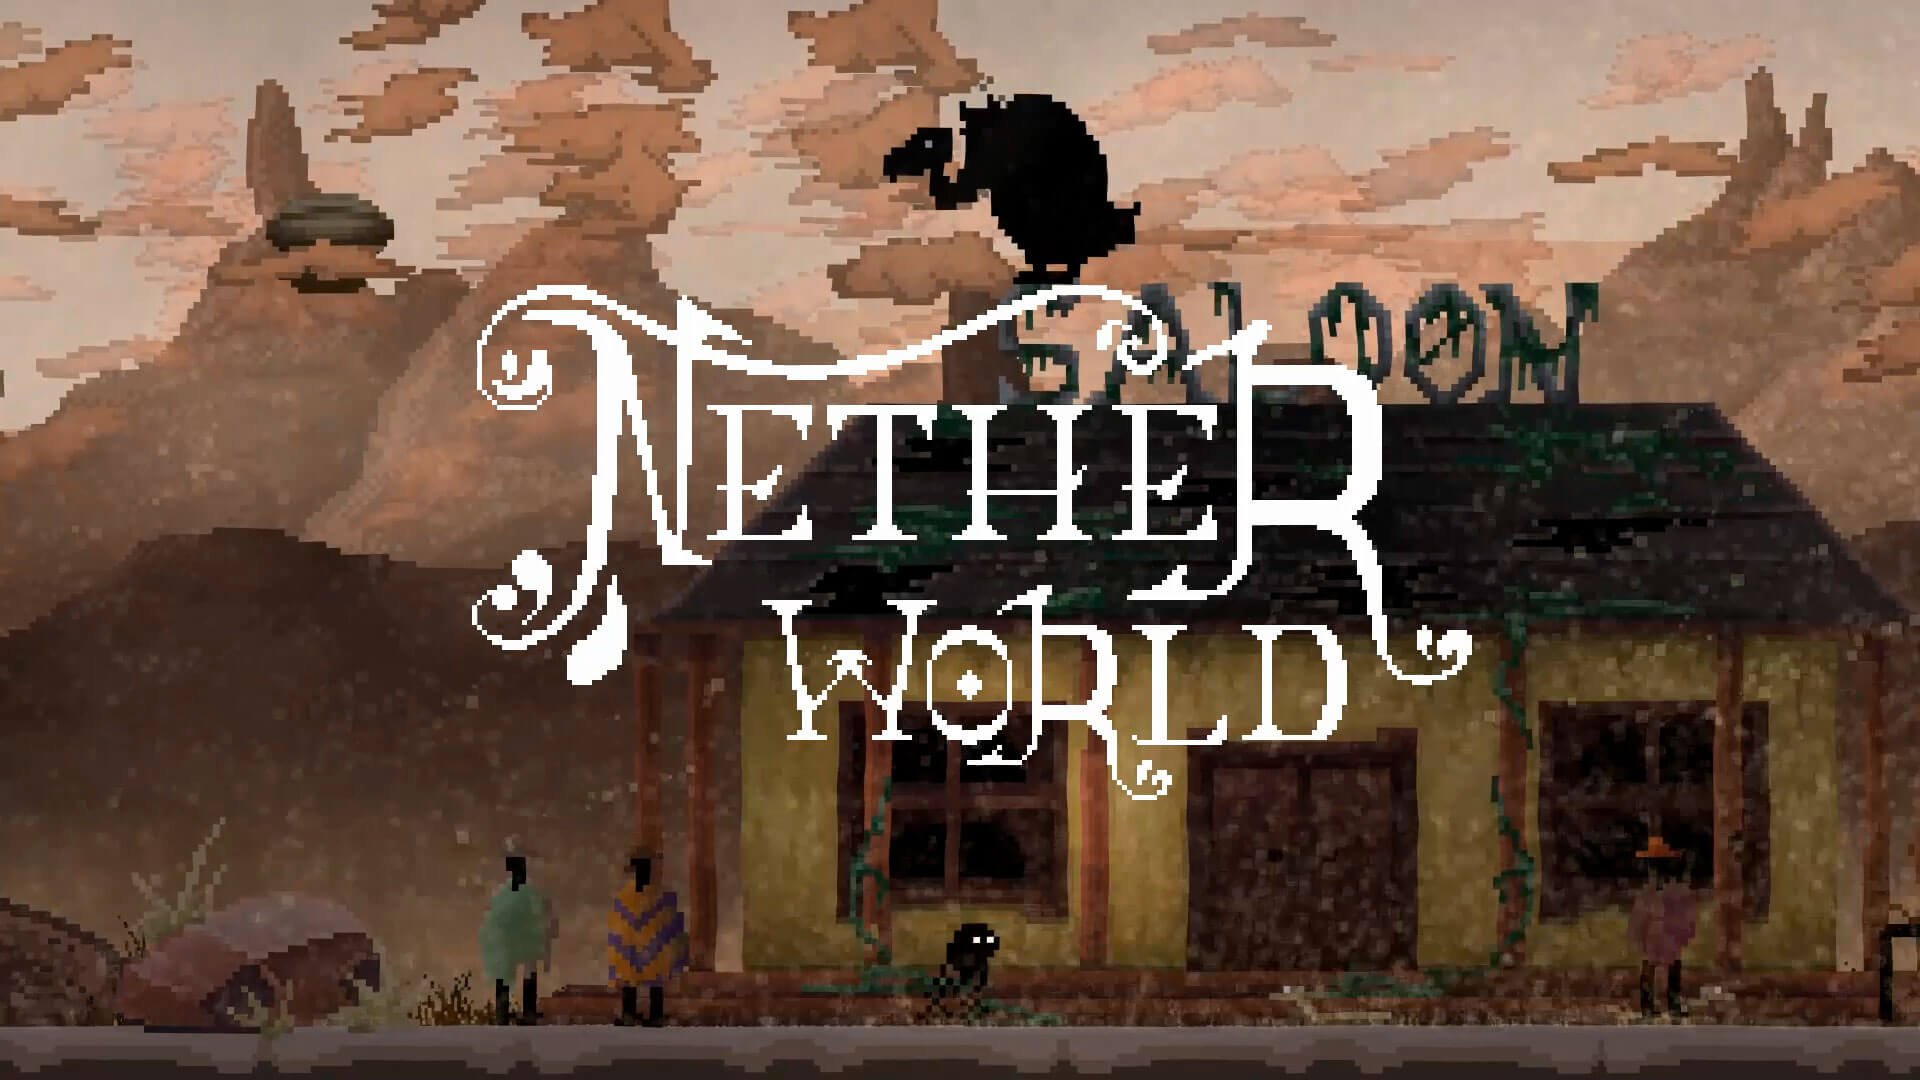 Netherworld launches on Kickstarter